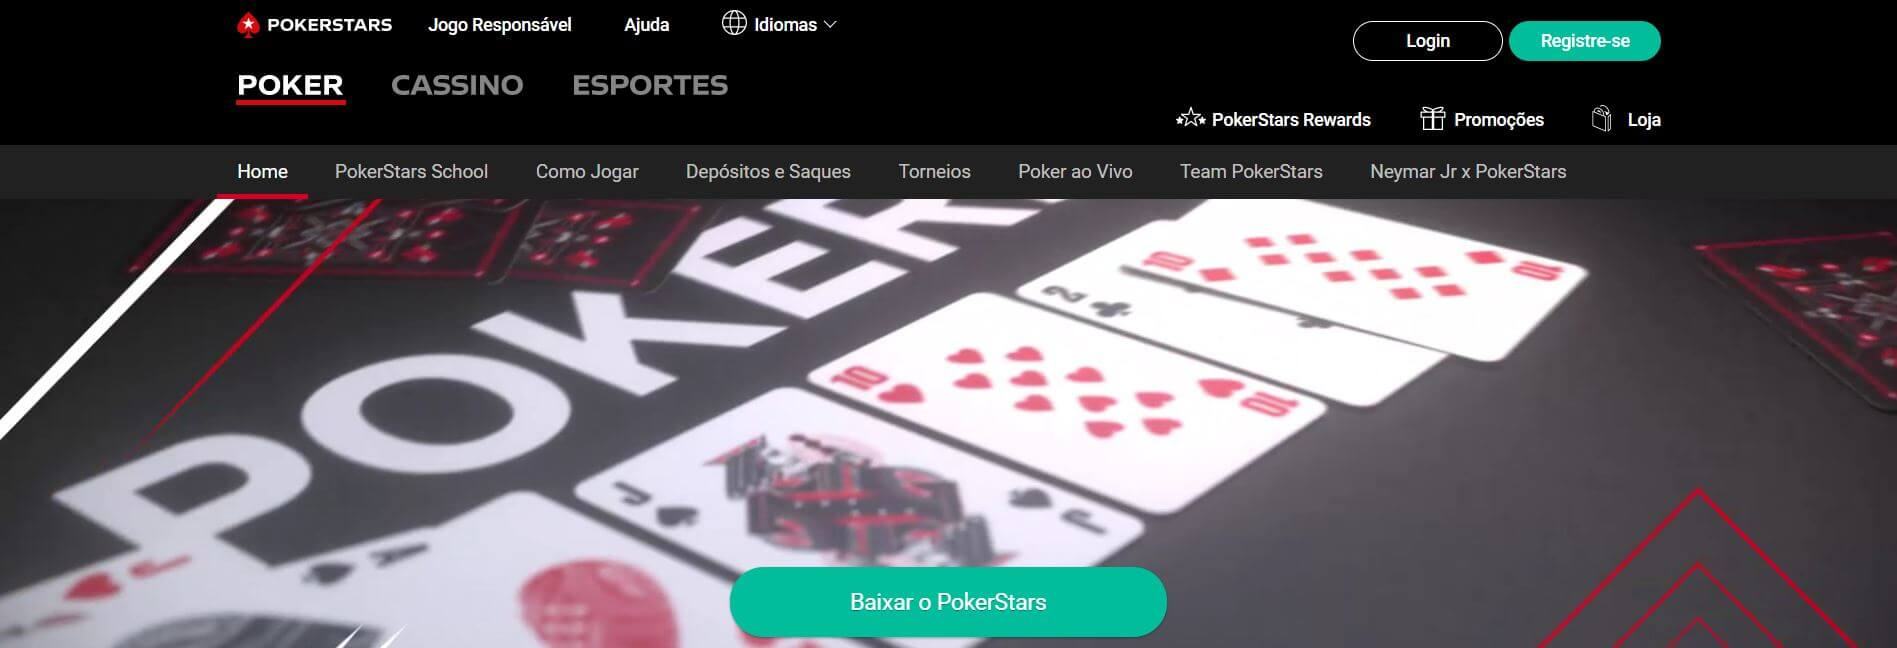 Codigo Bonus PokerStars homepage